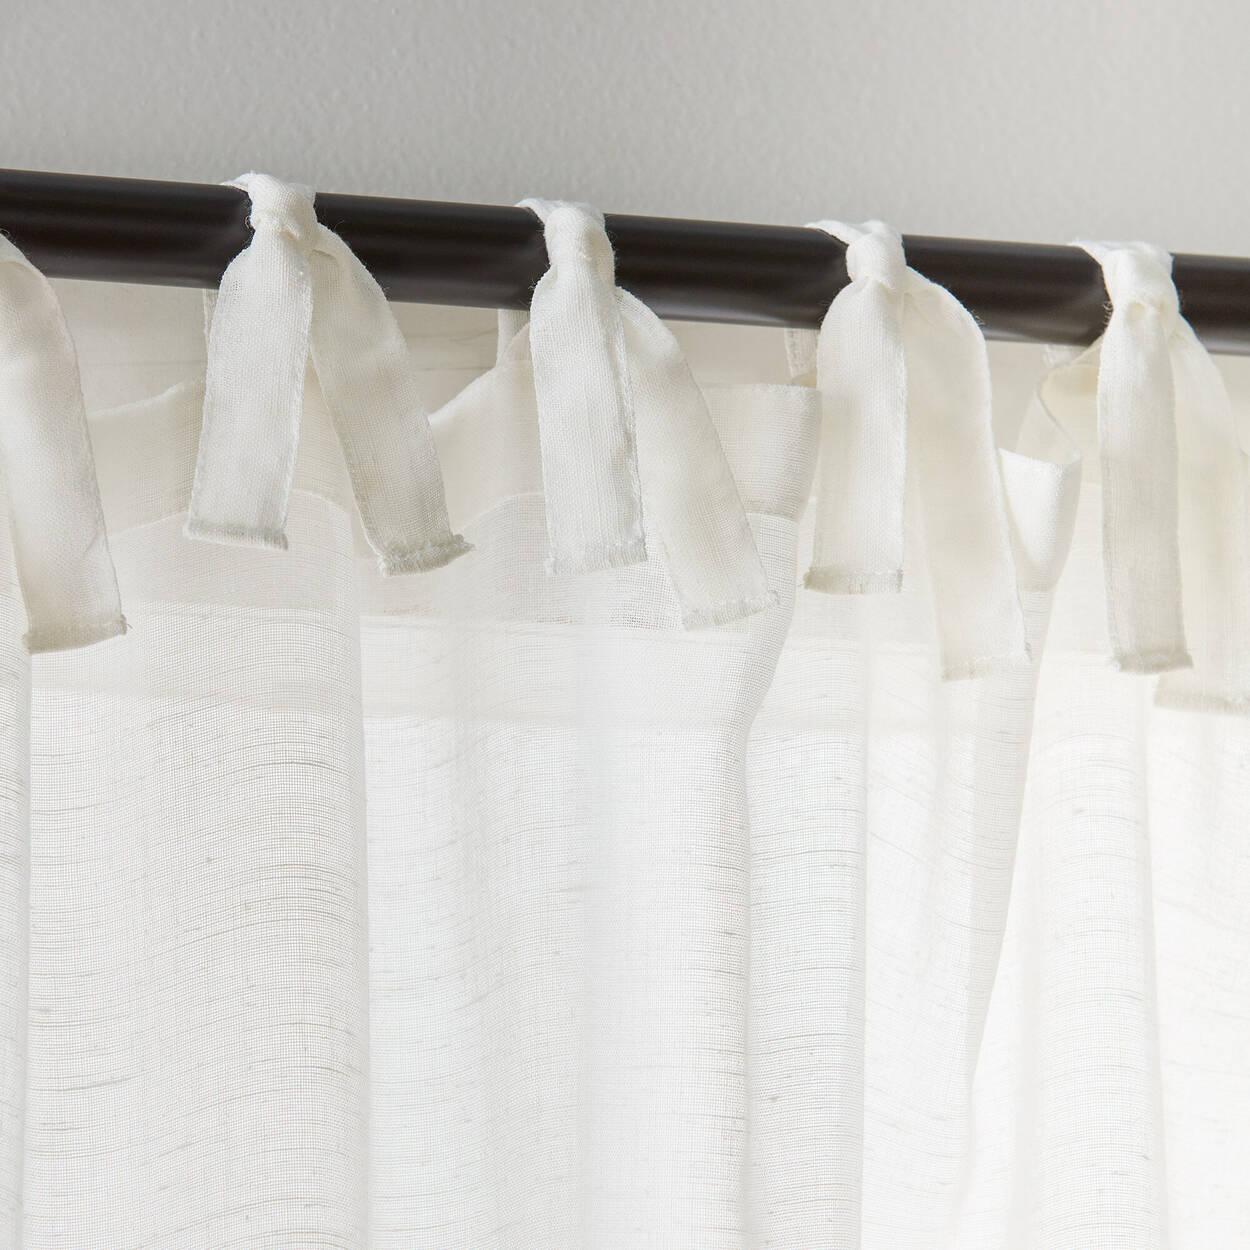 Jessica Tie Top Sheer Curtain